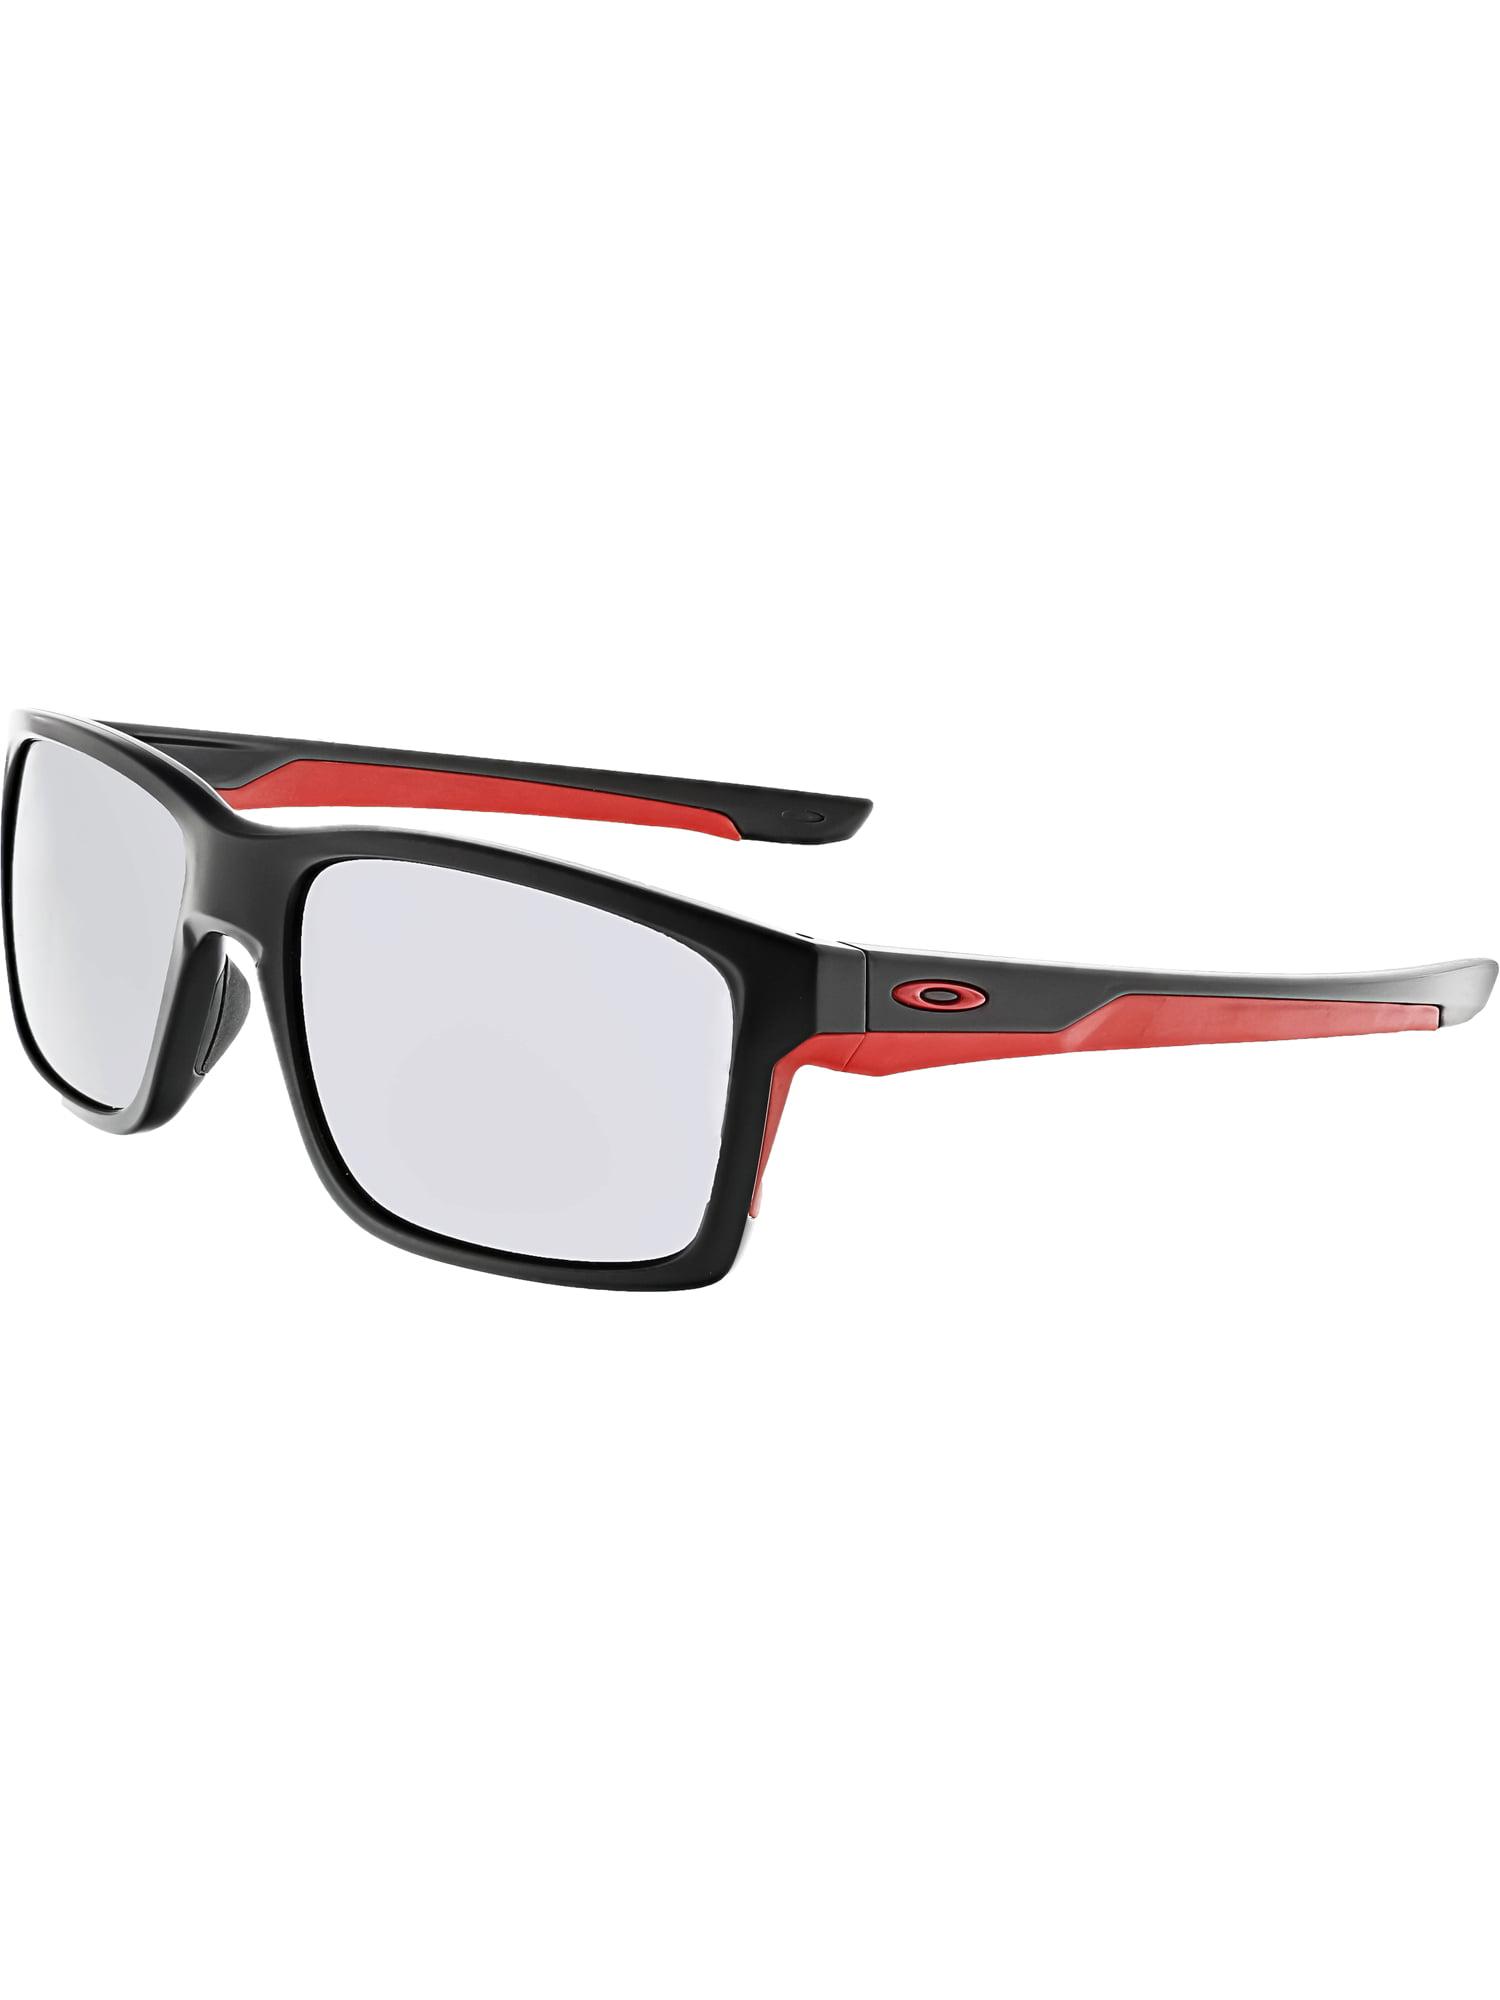 08d51fdae3 Oakley - Oakley Men s Mainlink OO9264-12 Black Square Sunglasses -  Walmart.com